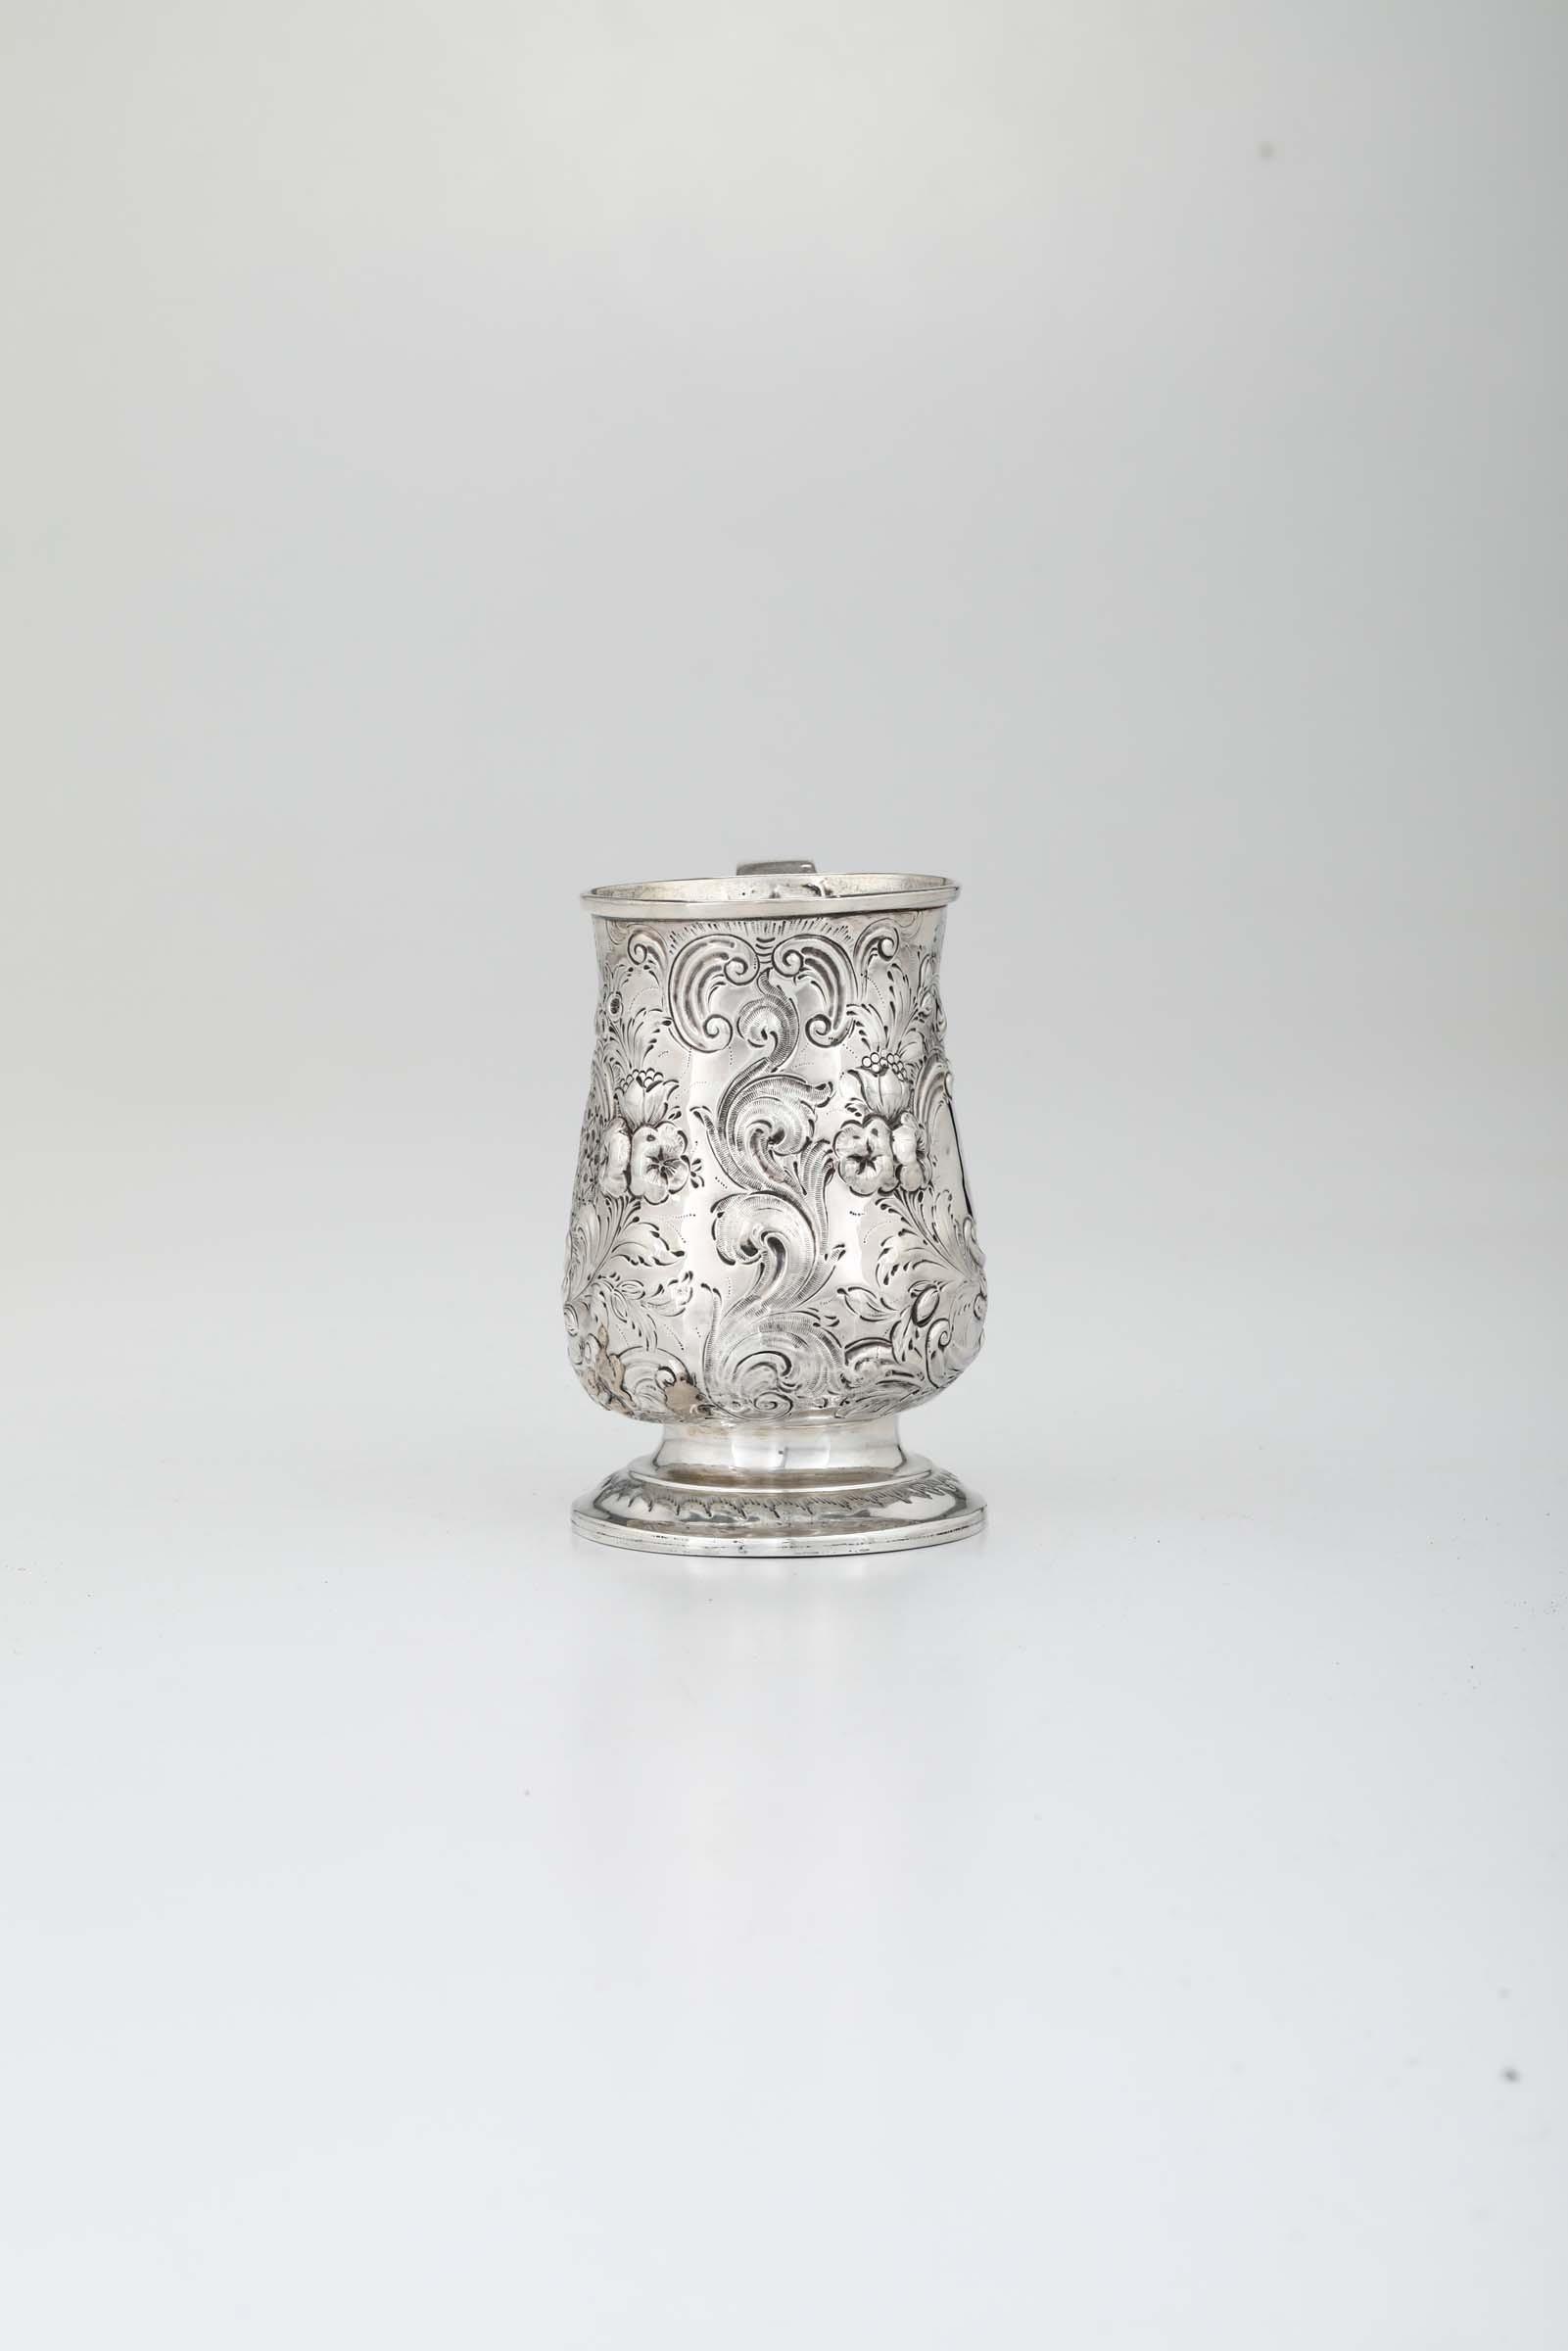 Lot 7 - A silver tankard, London, 1759 - H 13.3cm, 260gr -